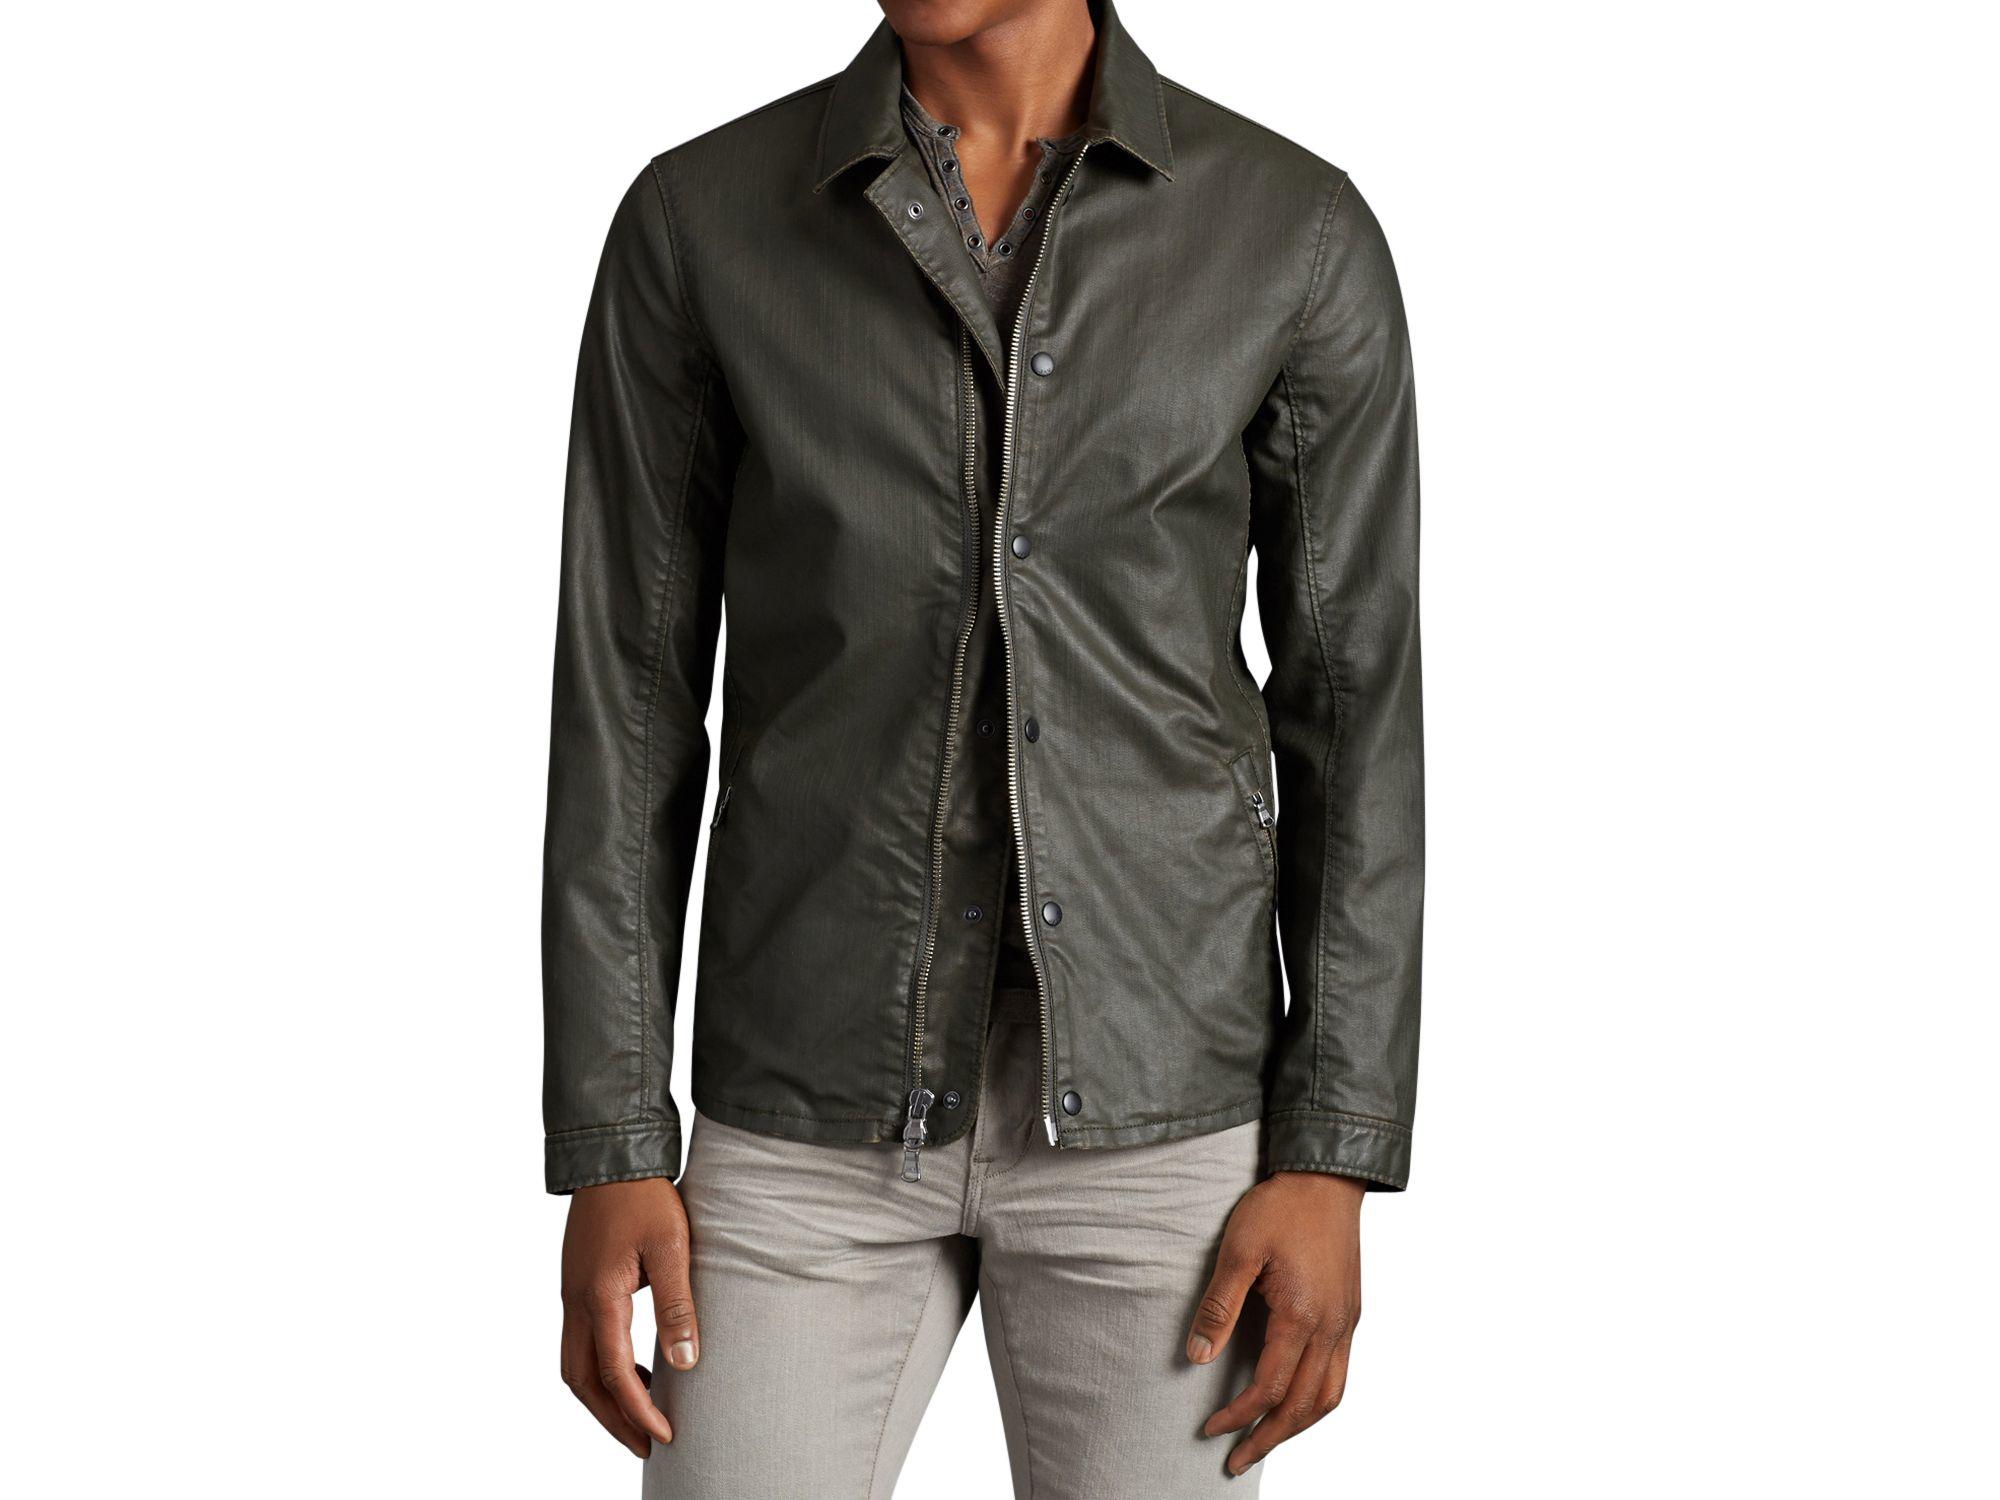 John varvatos John Varvatos Cotton Shirt Jacket in Green for Men ...